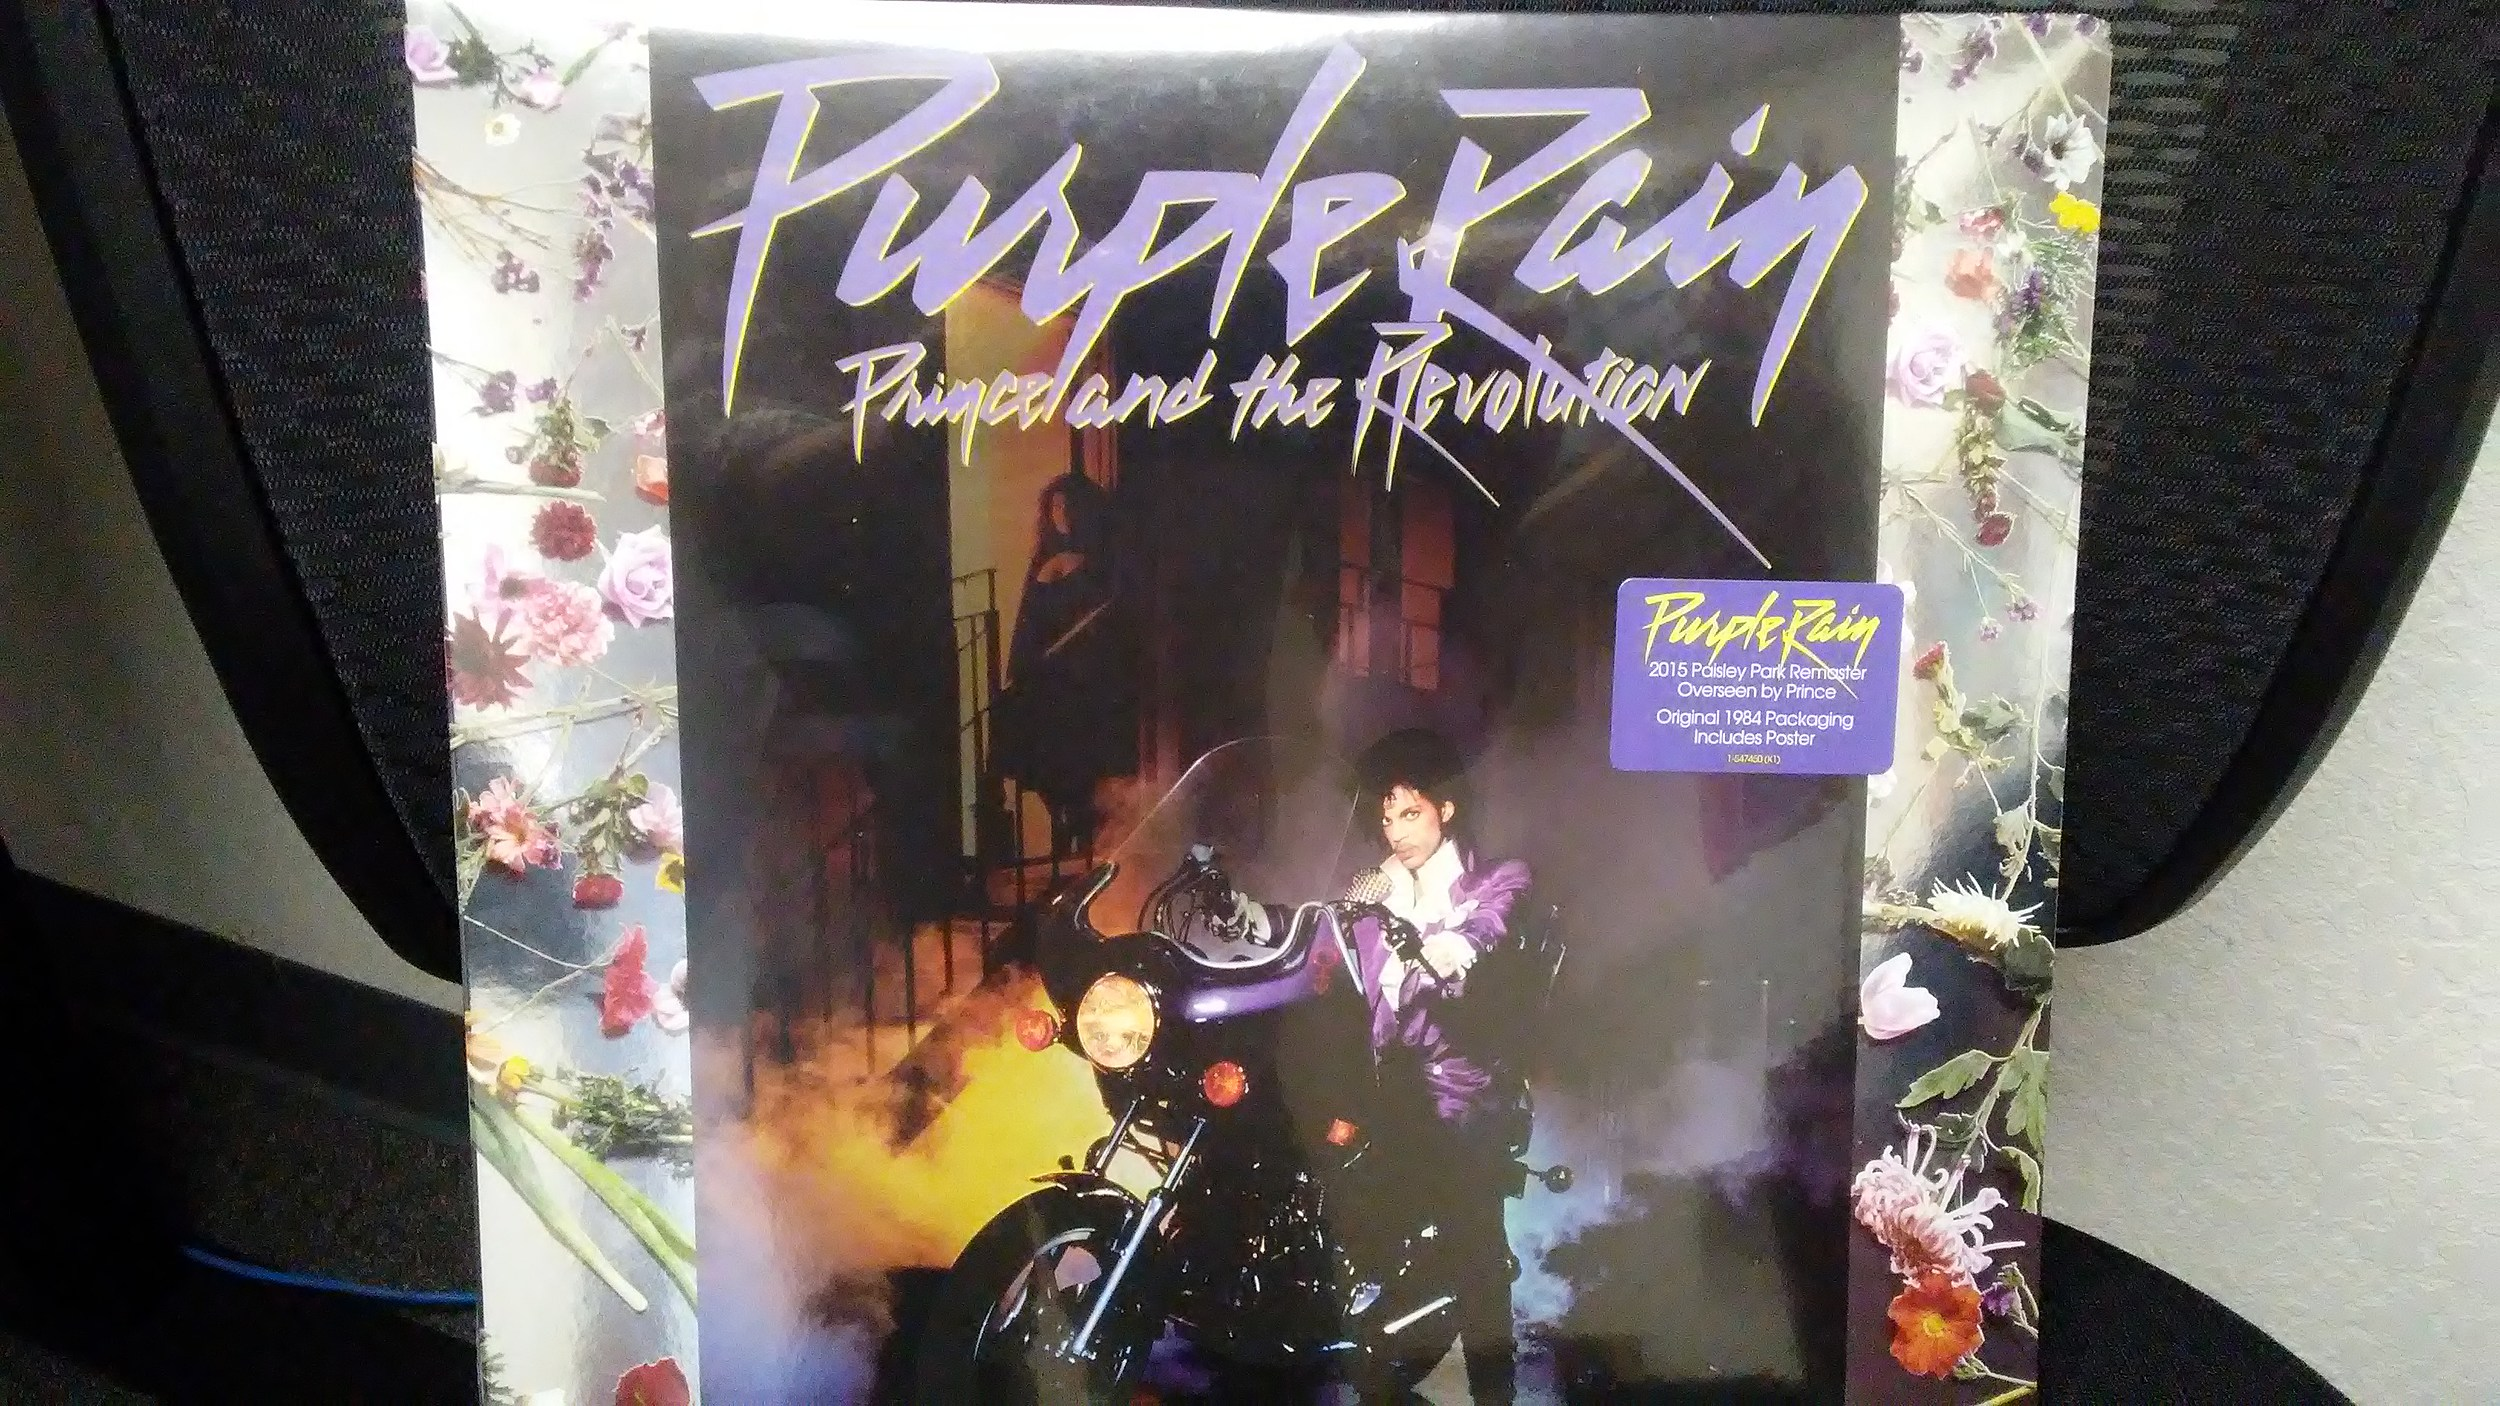 Win a Vinyl Copy of 'Purple Rain' and a Purple Portable Turntable